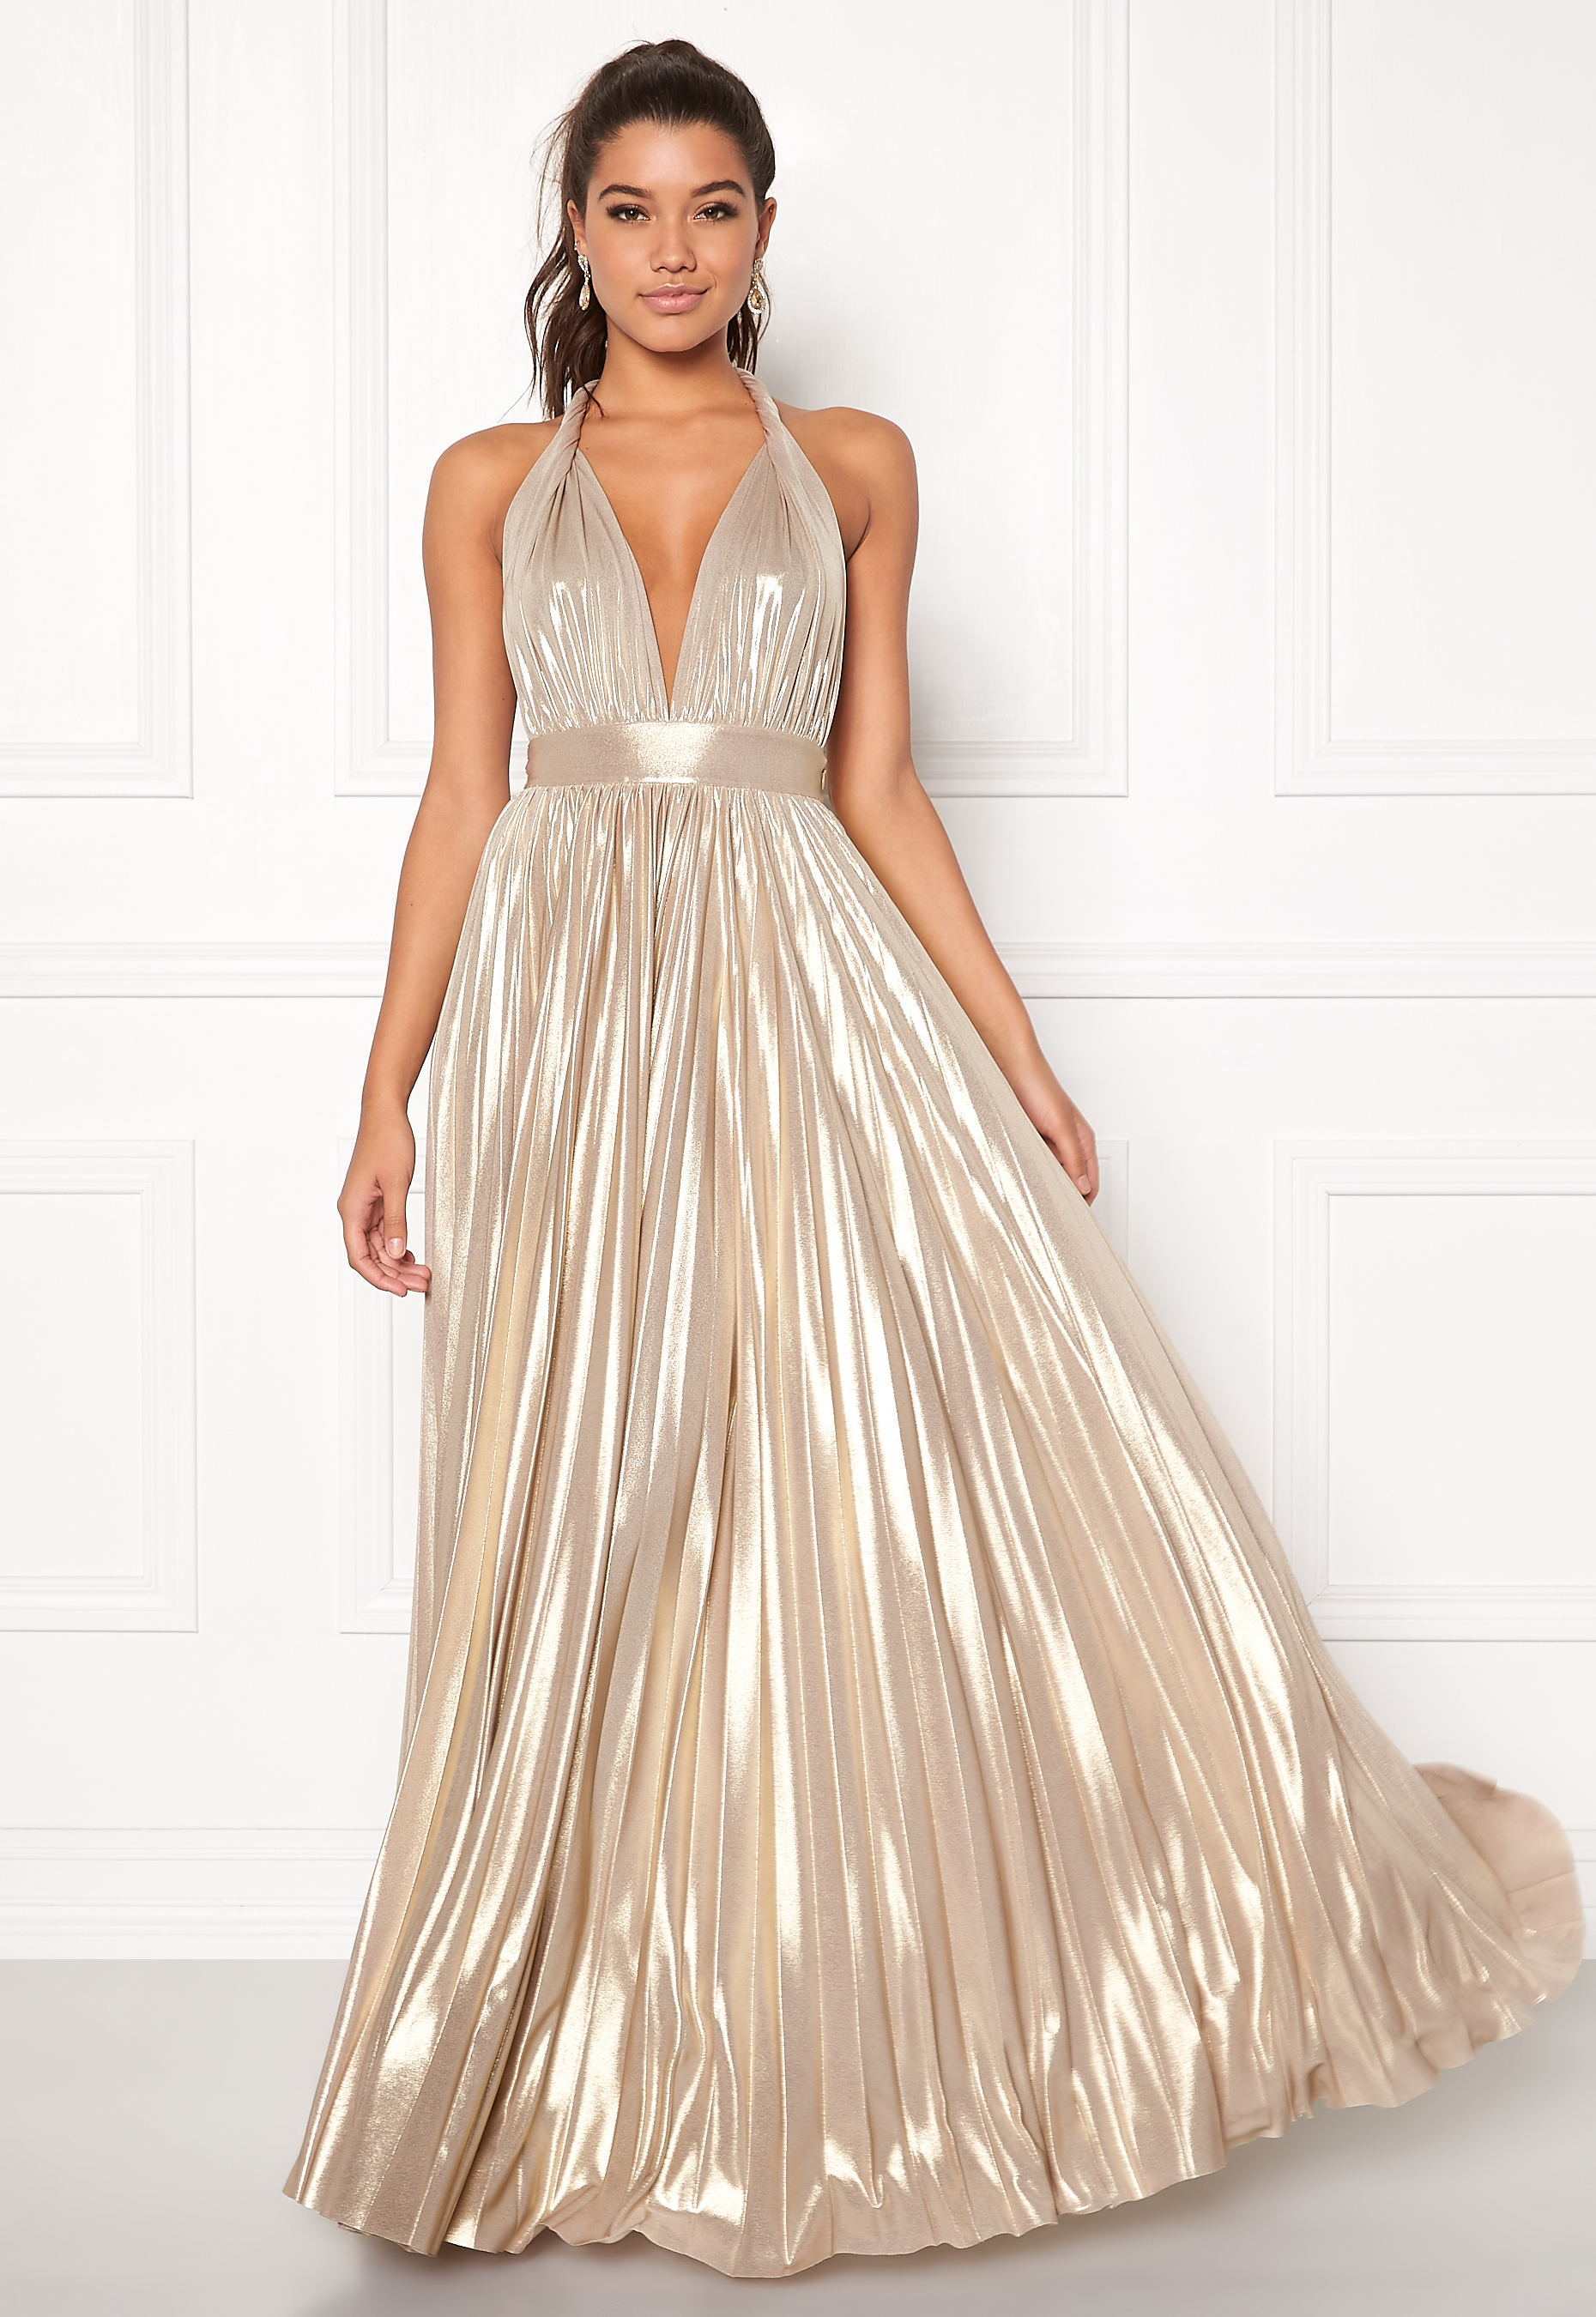 6bc66cf5 Irmeline Gown. GODDIVA. Deep V Neck Metallic Dress Gold. CHIARA FORTHI.  Viviere Sparkling Gown Midnight Blue. ZETTERBERG COUTURE. Stella Dress Ivory /Nude